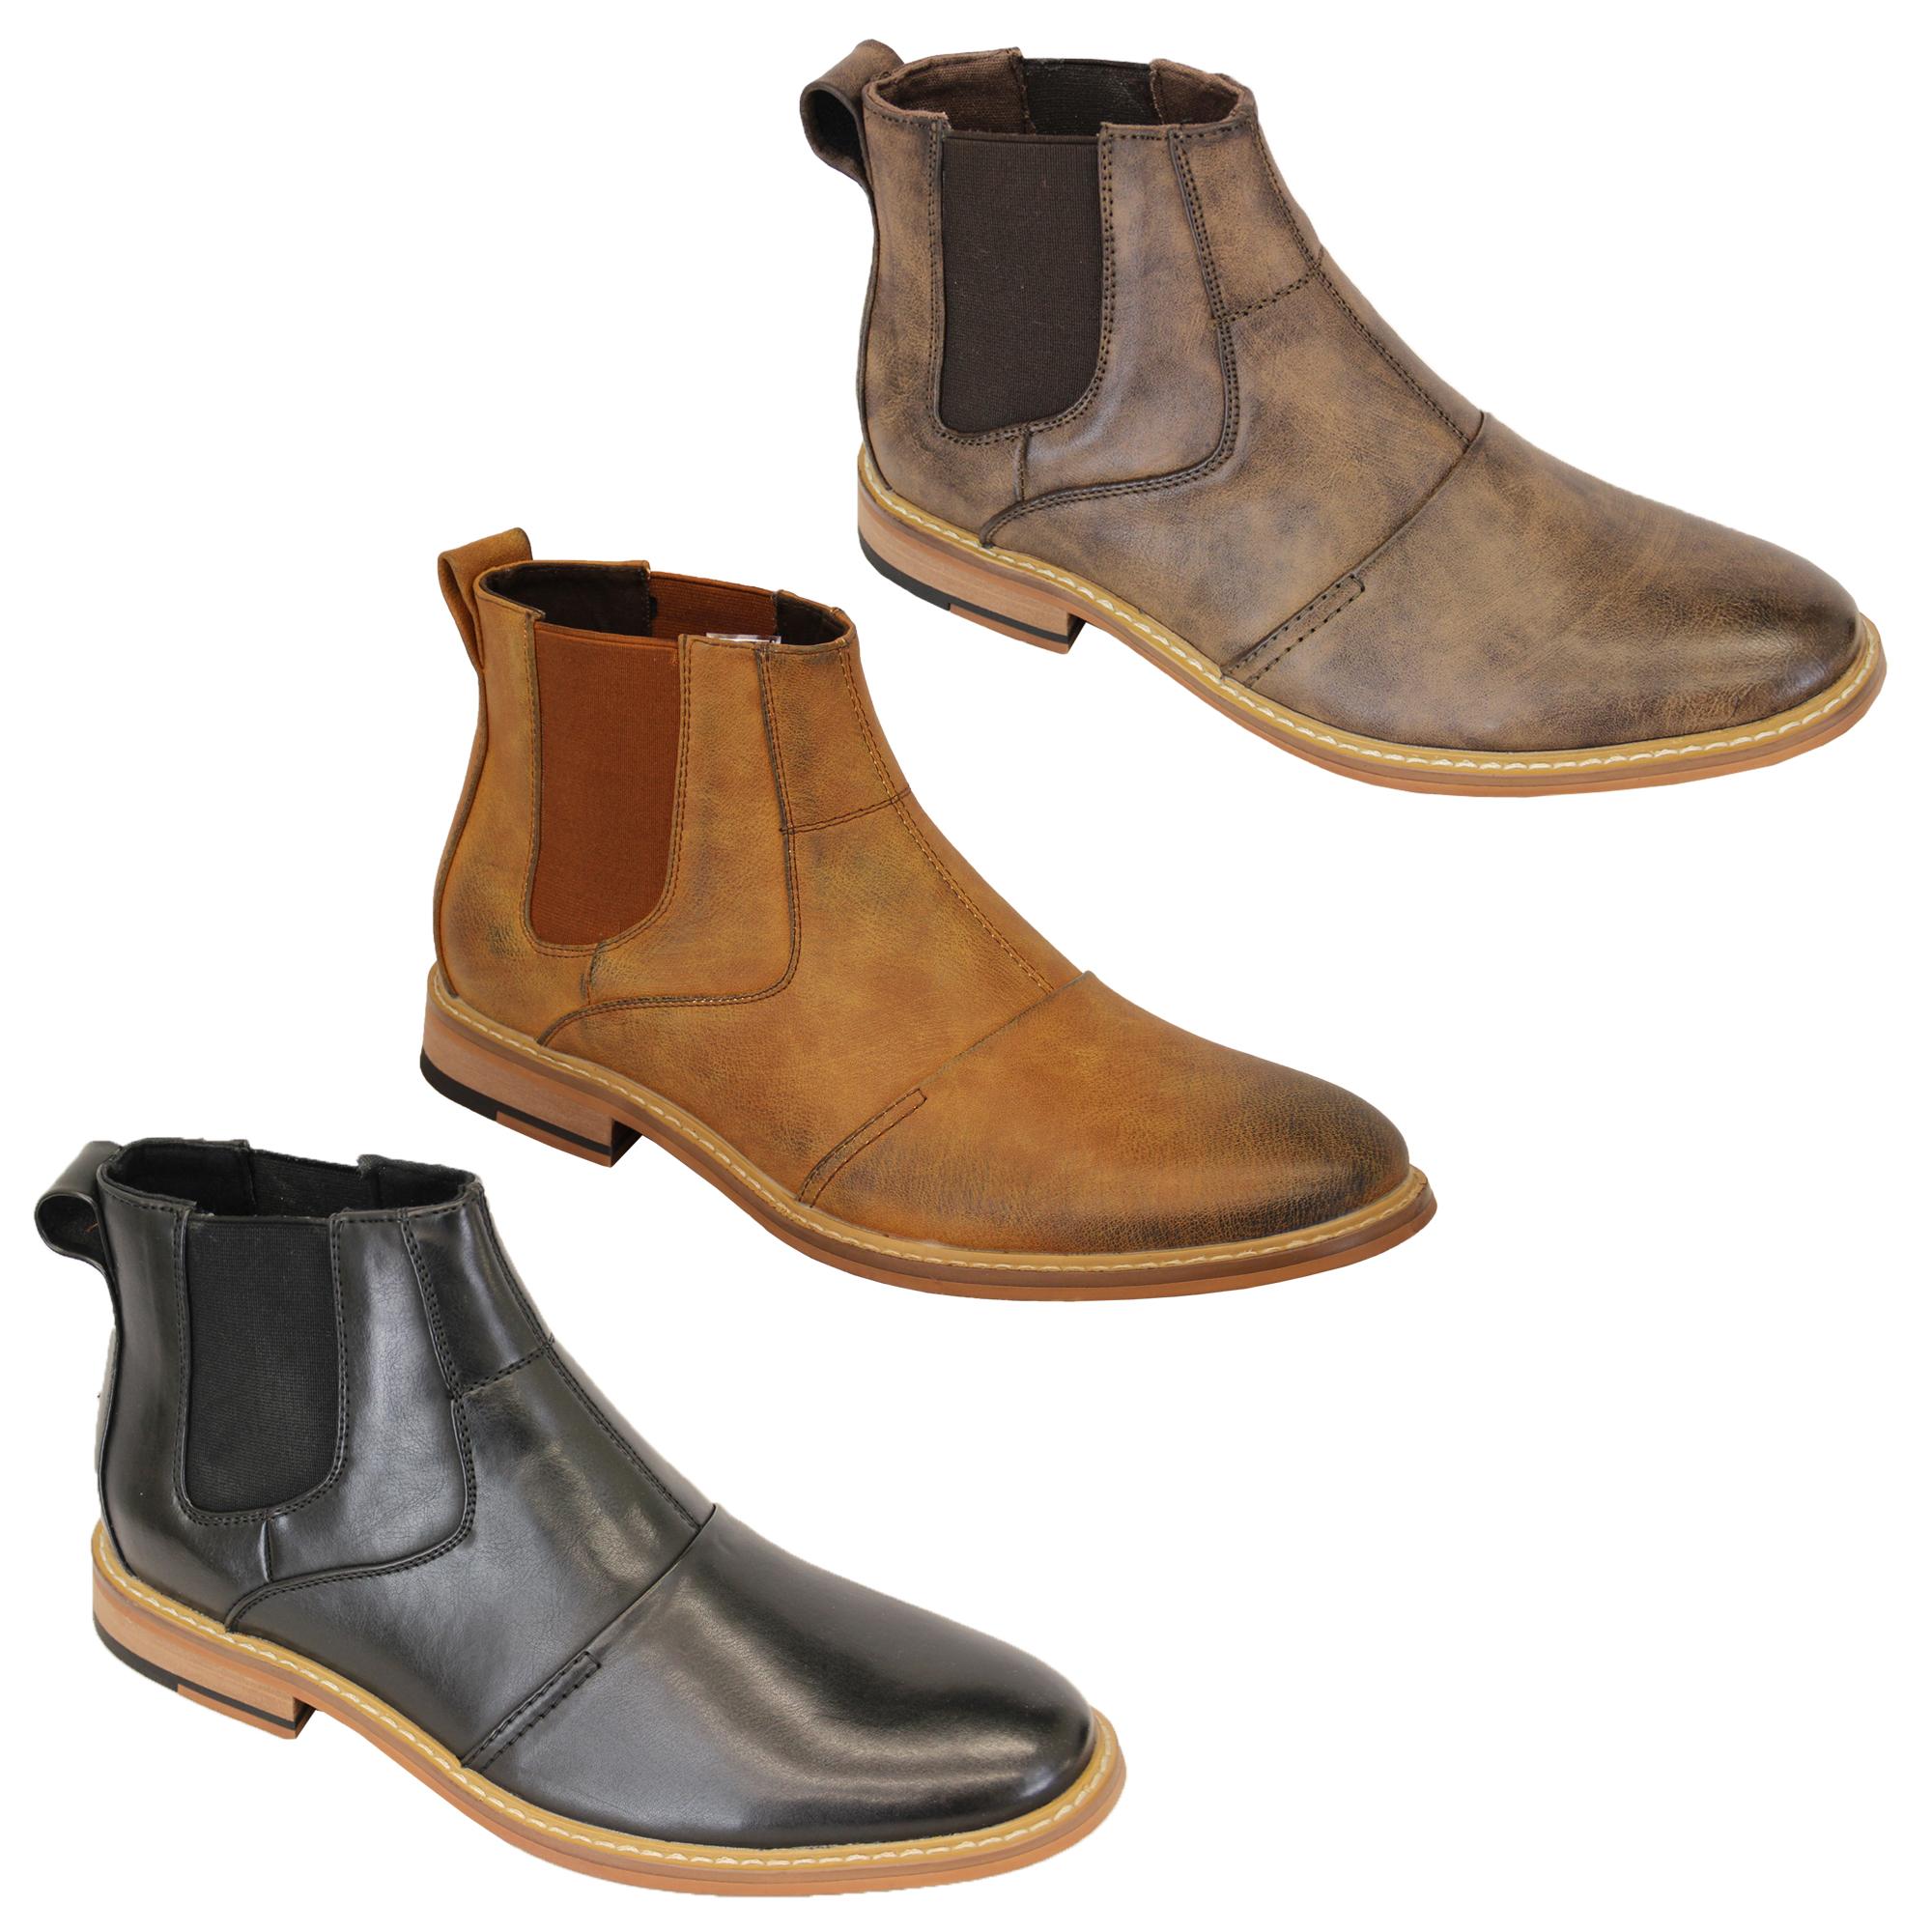 e8940dfad39a Mens Cavani Boots Chelsea Dealer Shoes High Ankle Leather Look ...